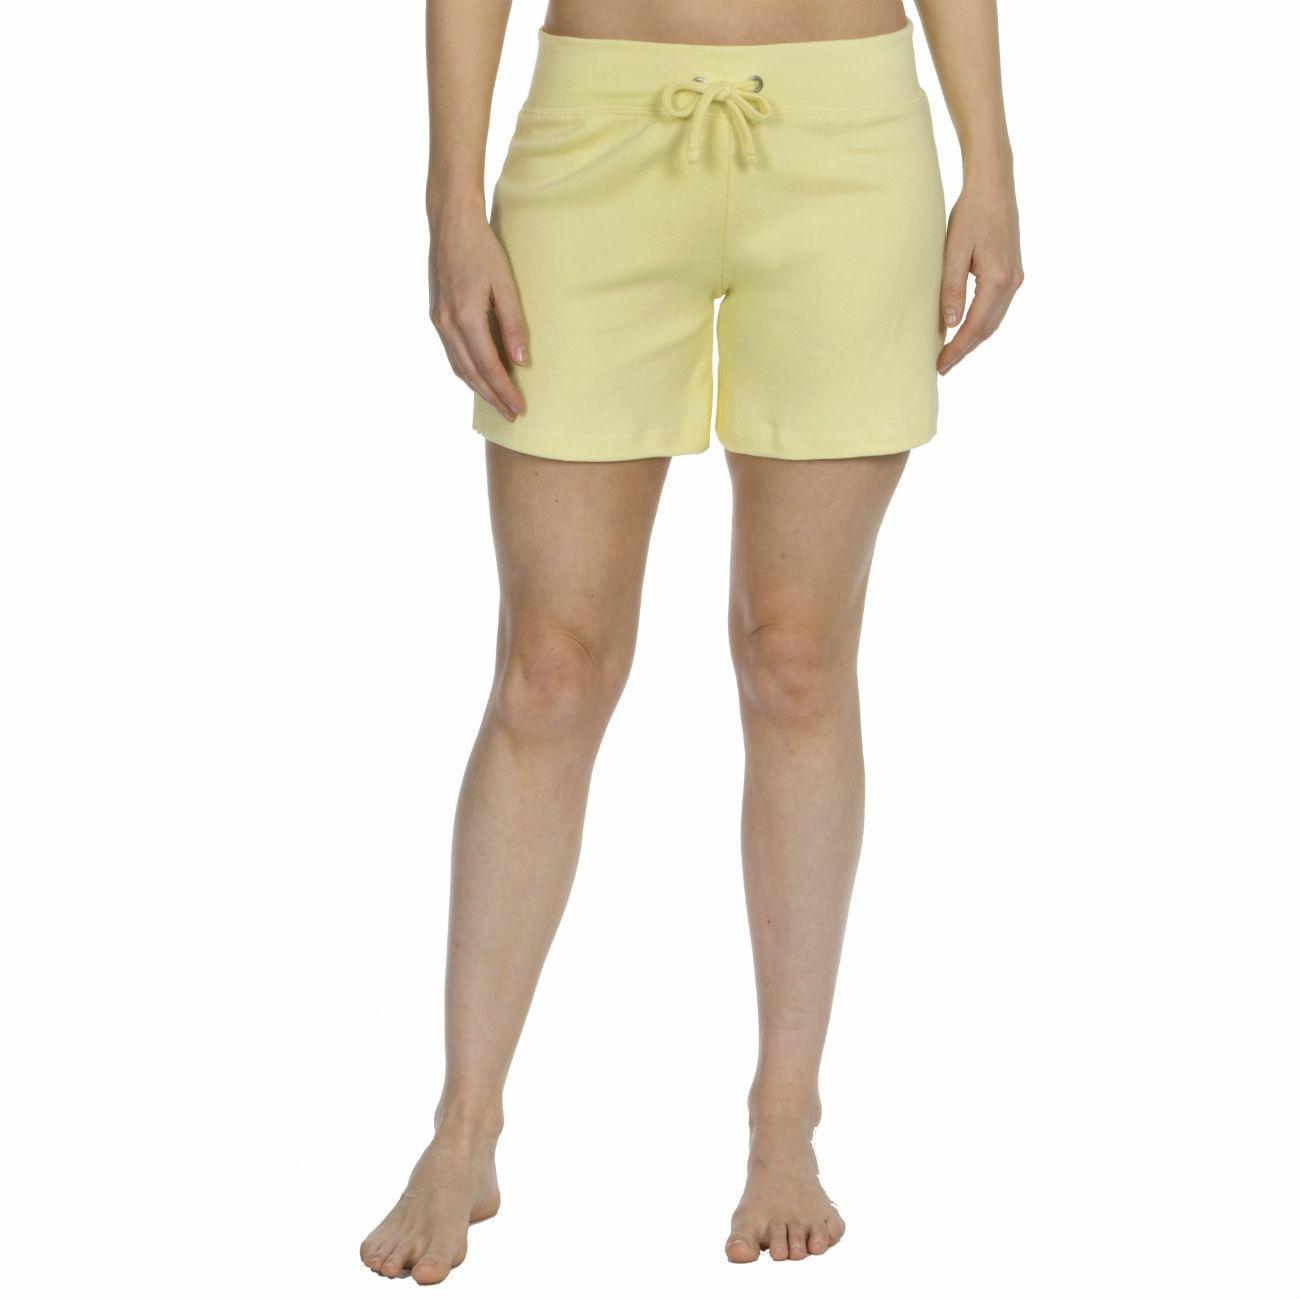 Womens-Cotton-Jersey-Shorts-Elastic-Waist-Summer-Beach-Casual-Yoga-Hot-Pants-New thumbnail 40